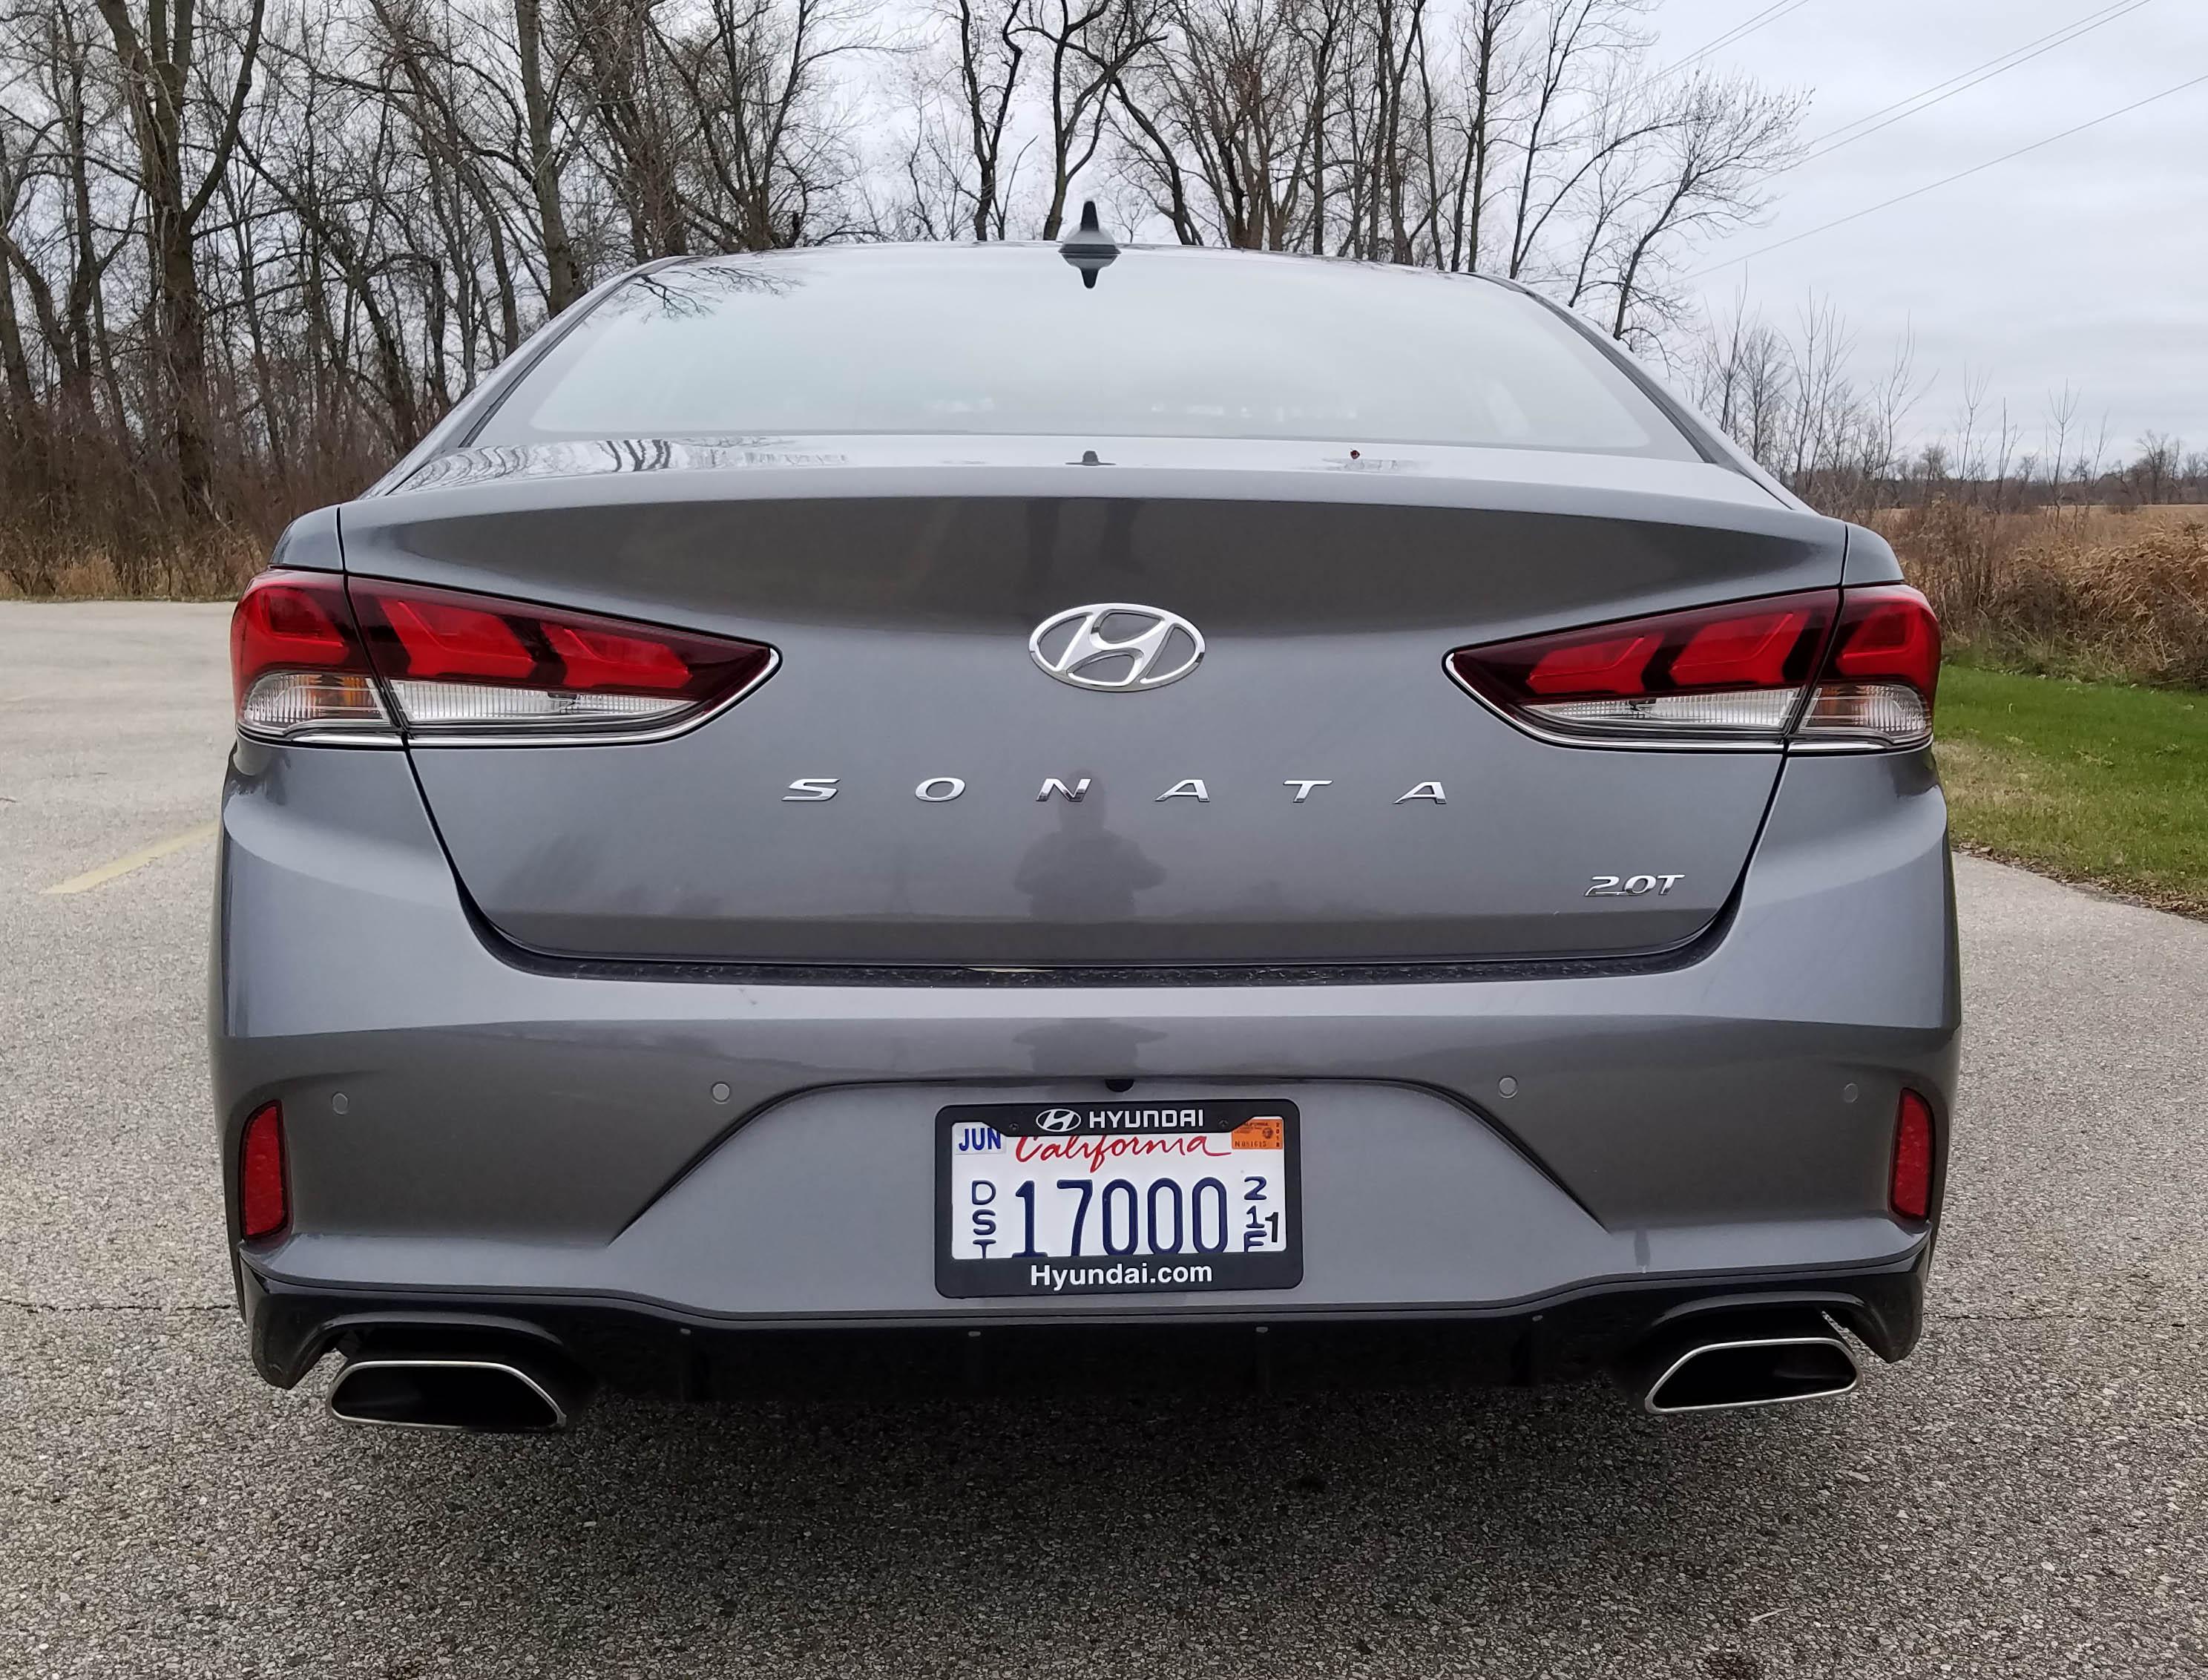 hyundai cars sonata sport cockpit en and trend canada motor reviews rating limited